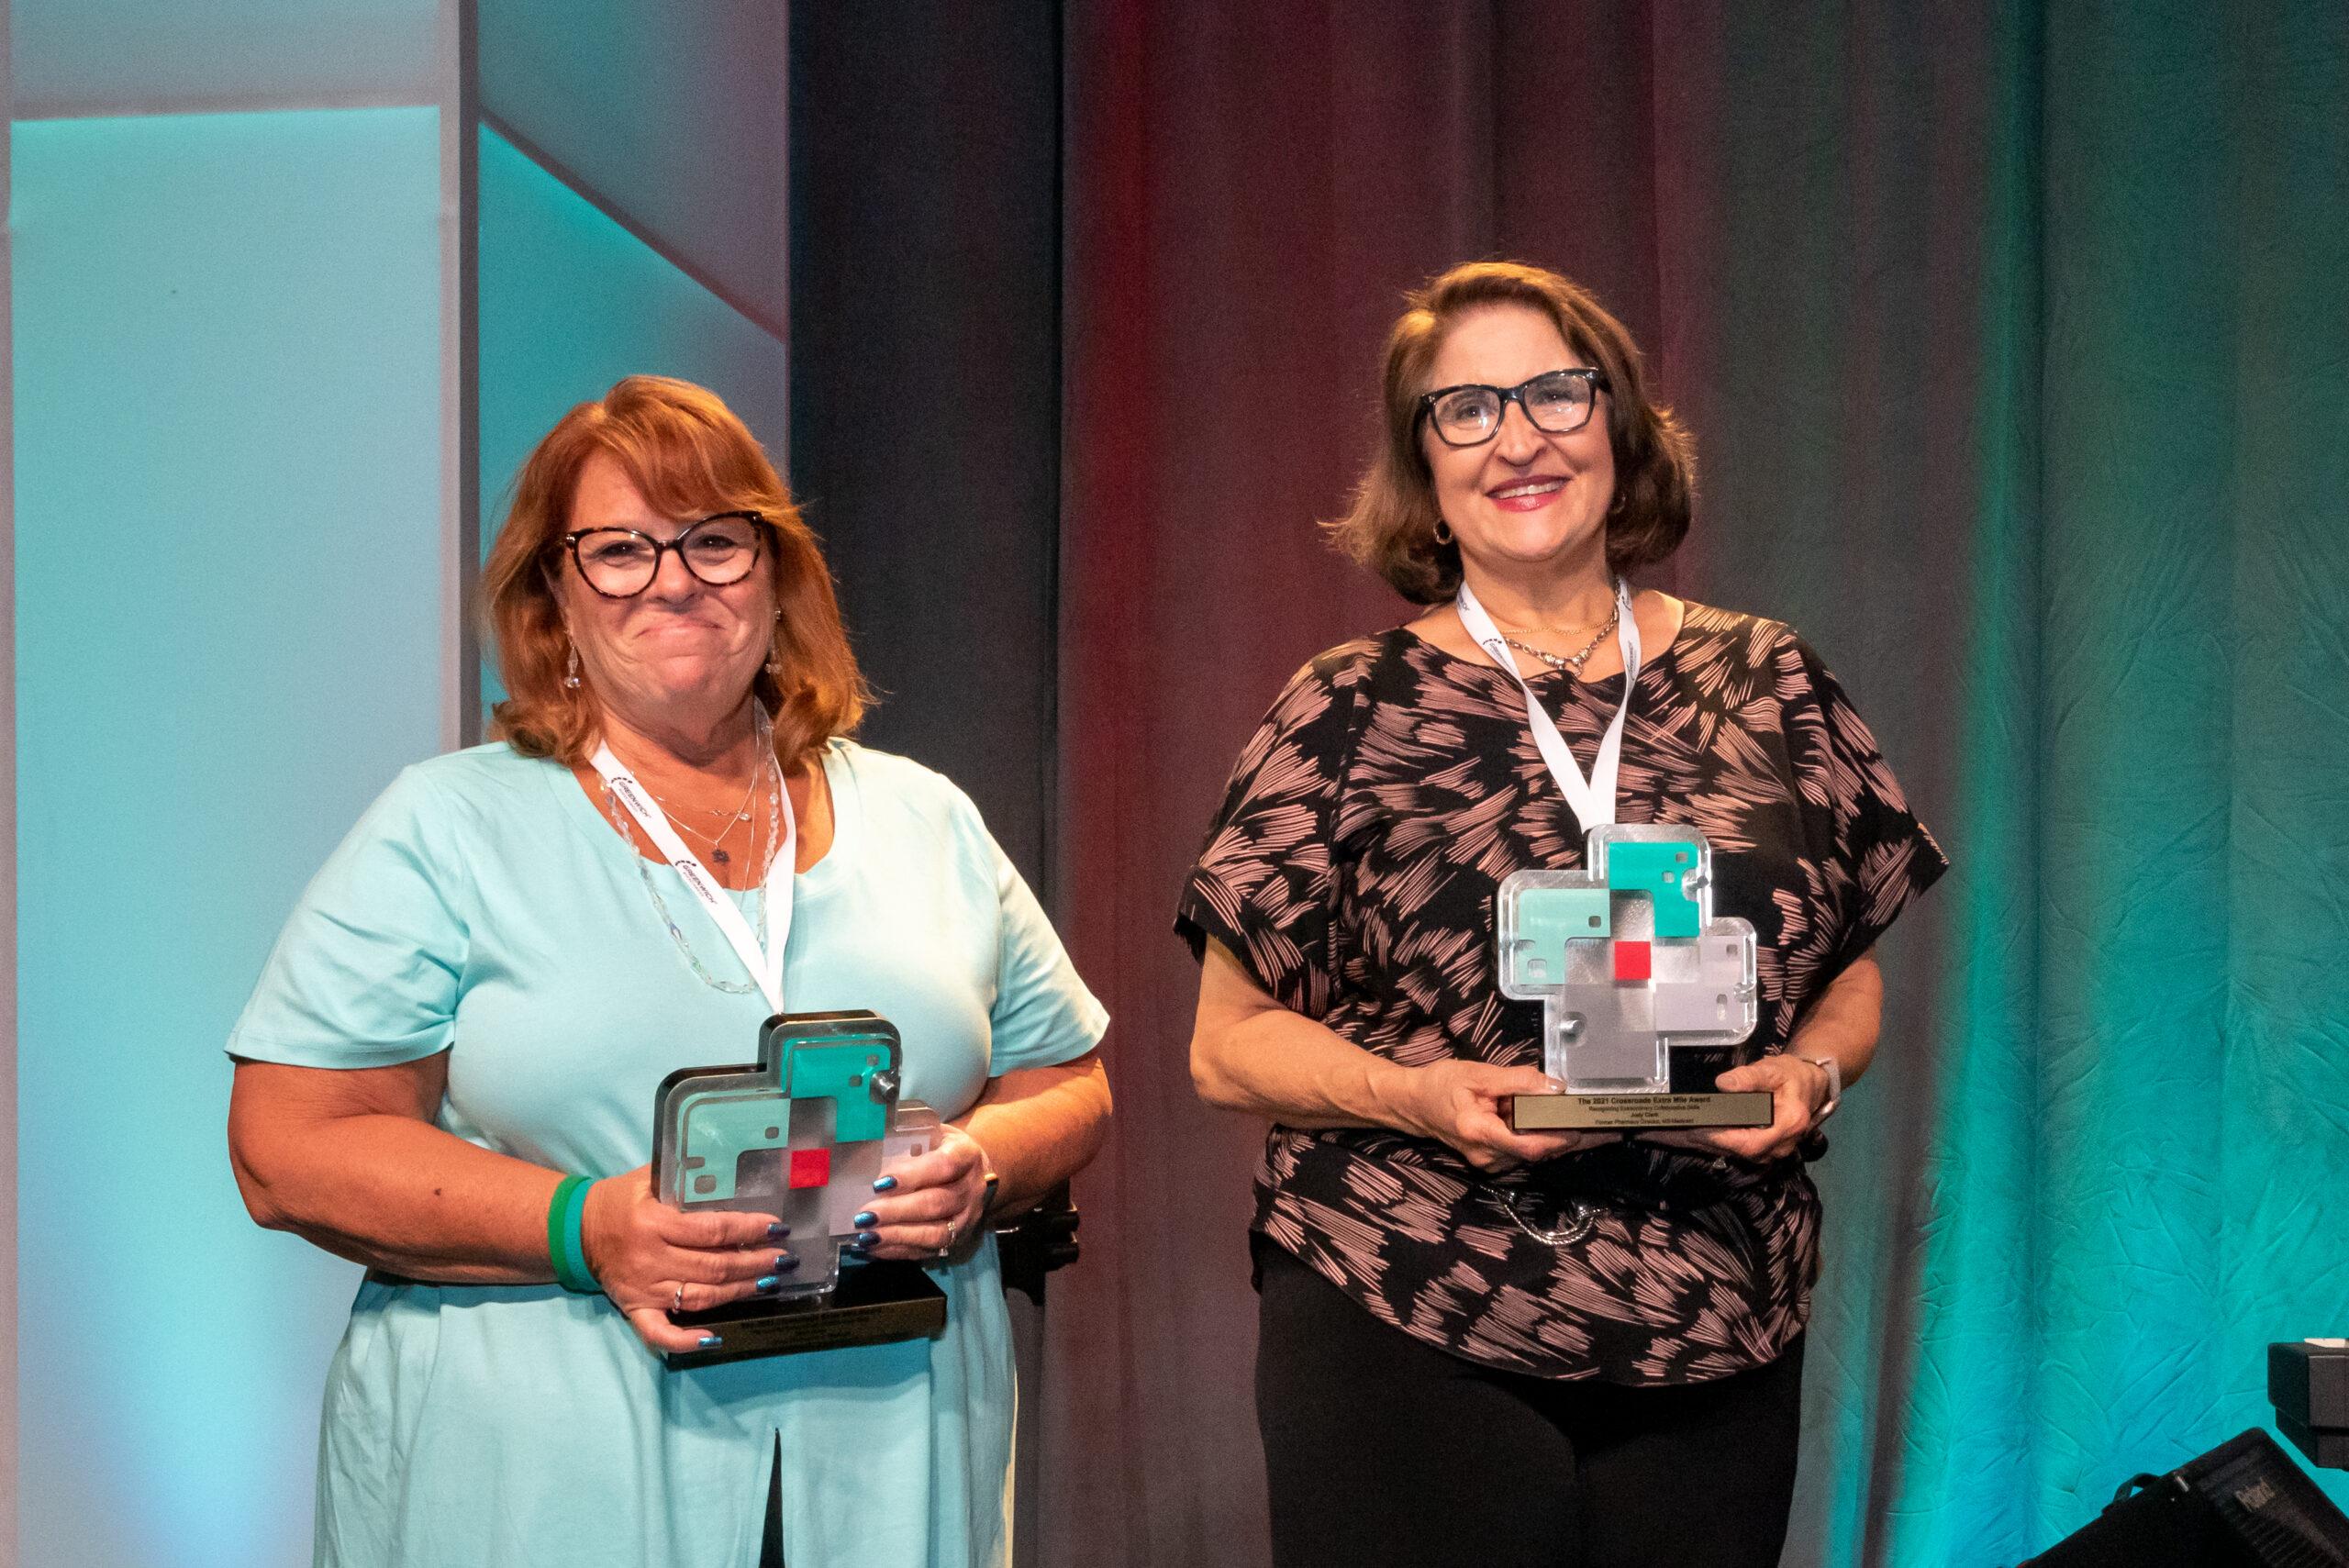 Sheri Dolan and Judy Clark - Extra Mile Award Winners at Artia Crossroads 2021